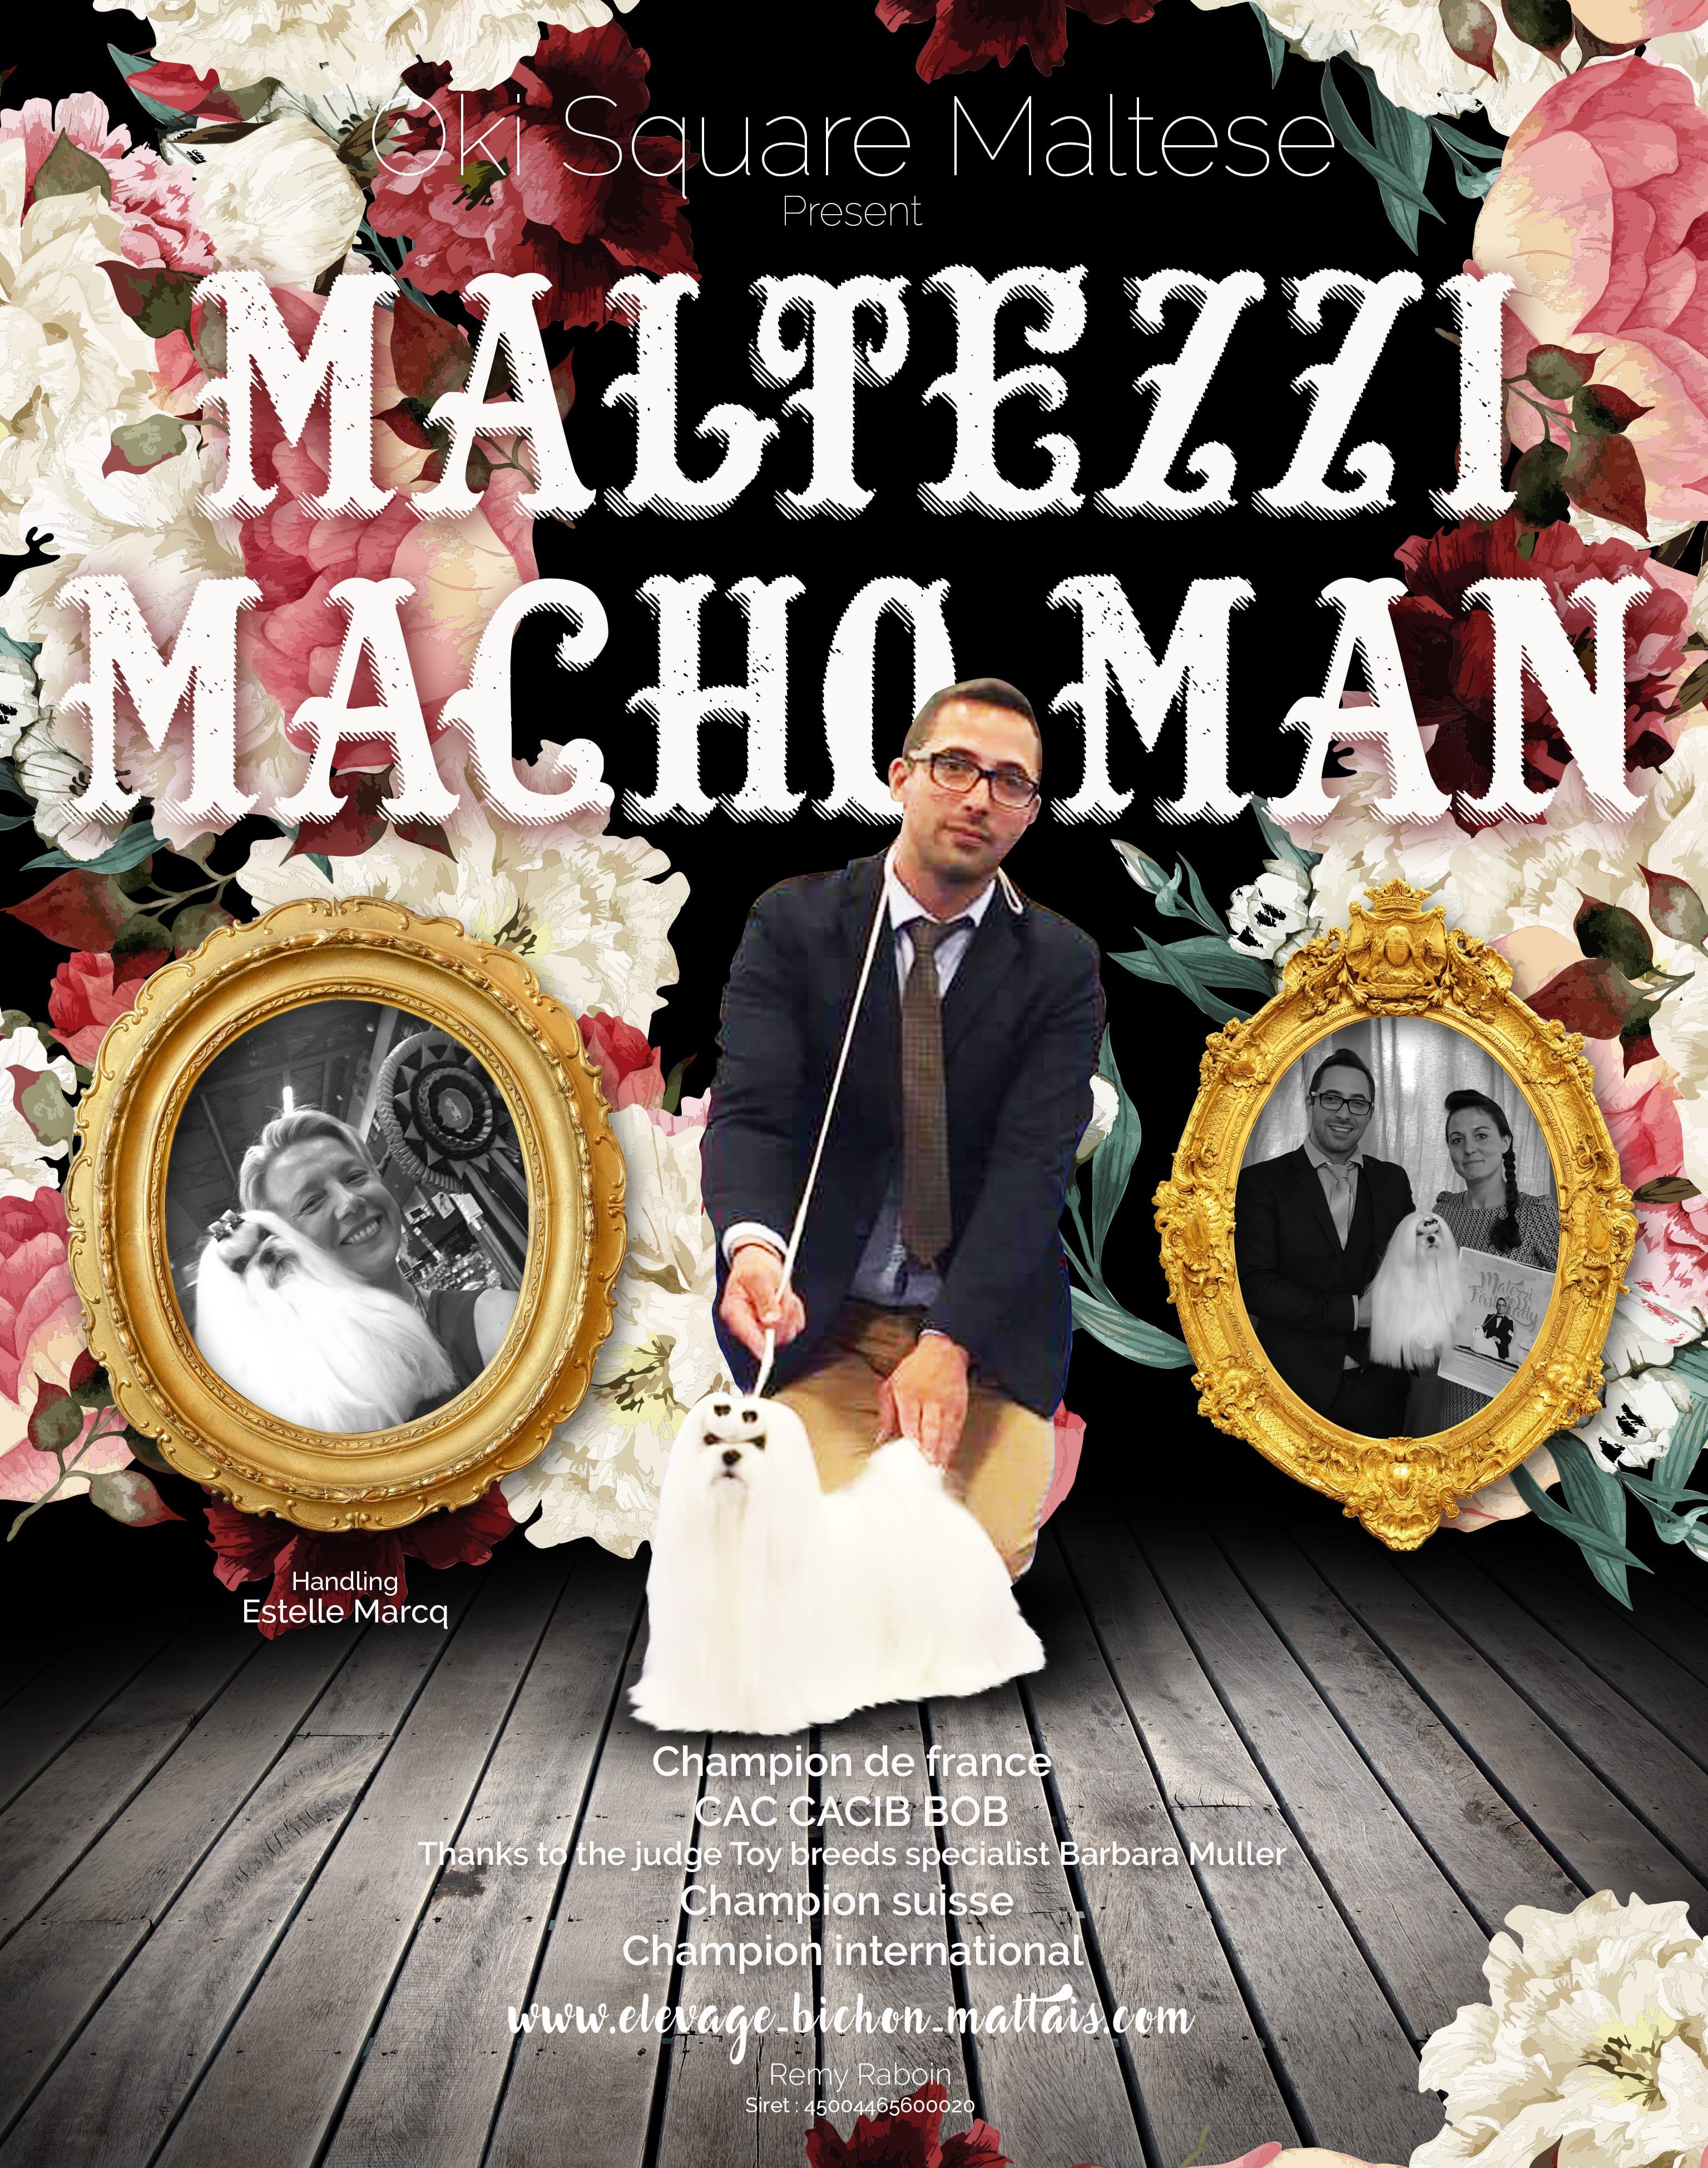 Oki Square Maltezzi Macho Man